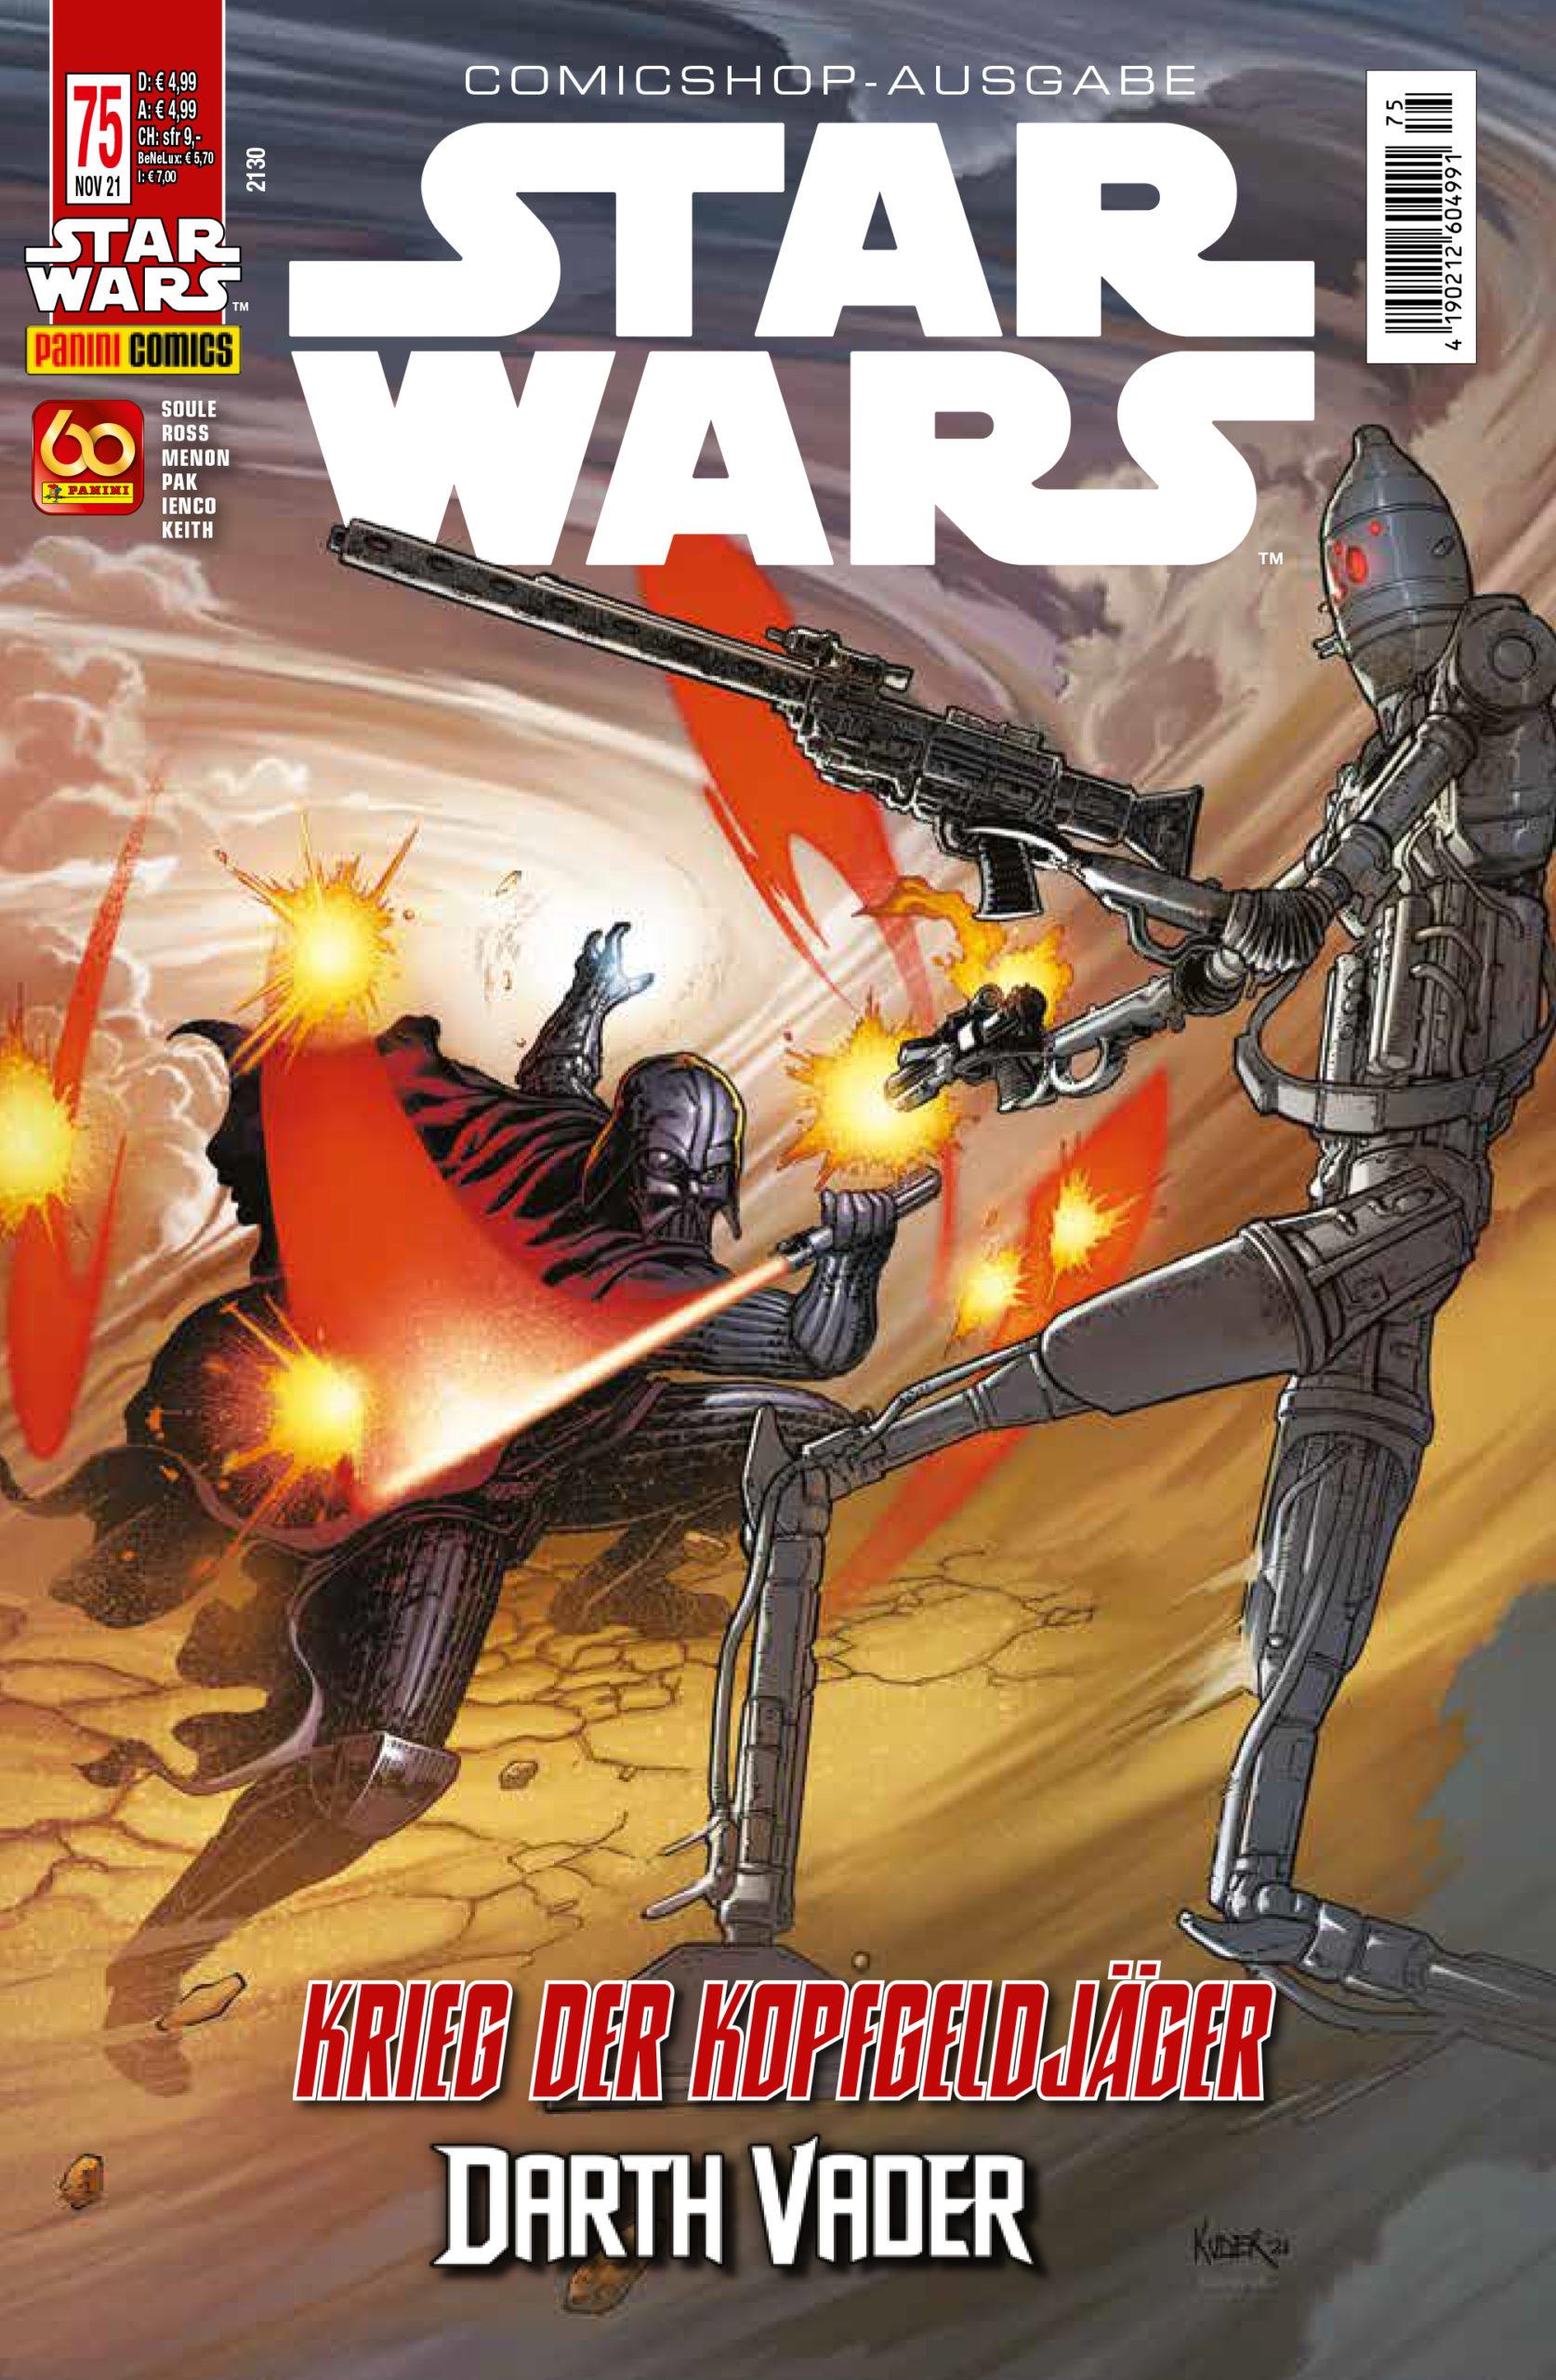 Star Wars #75 (Comicshop-Ausgabe) (20.10.2021)